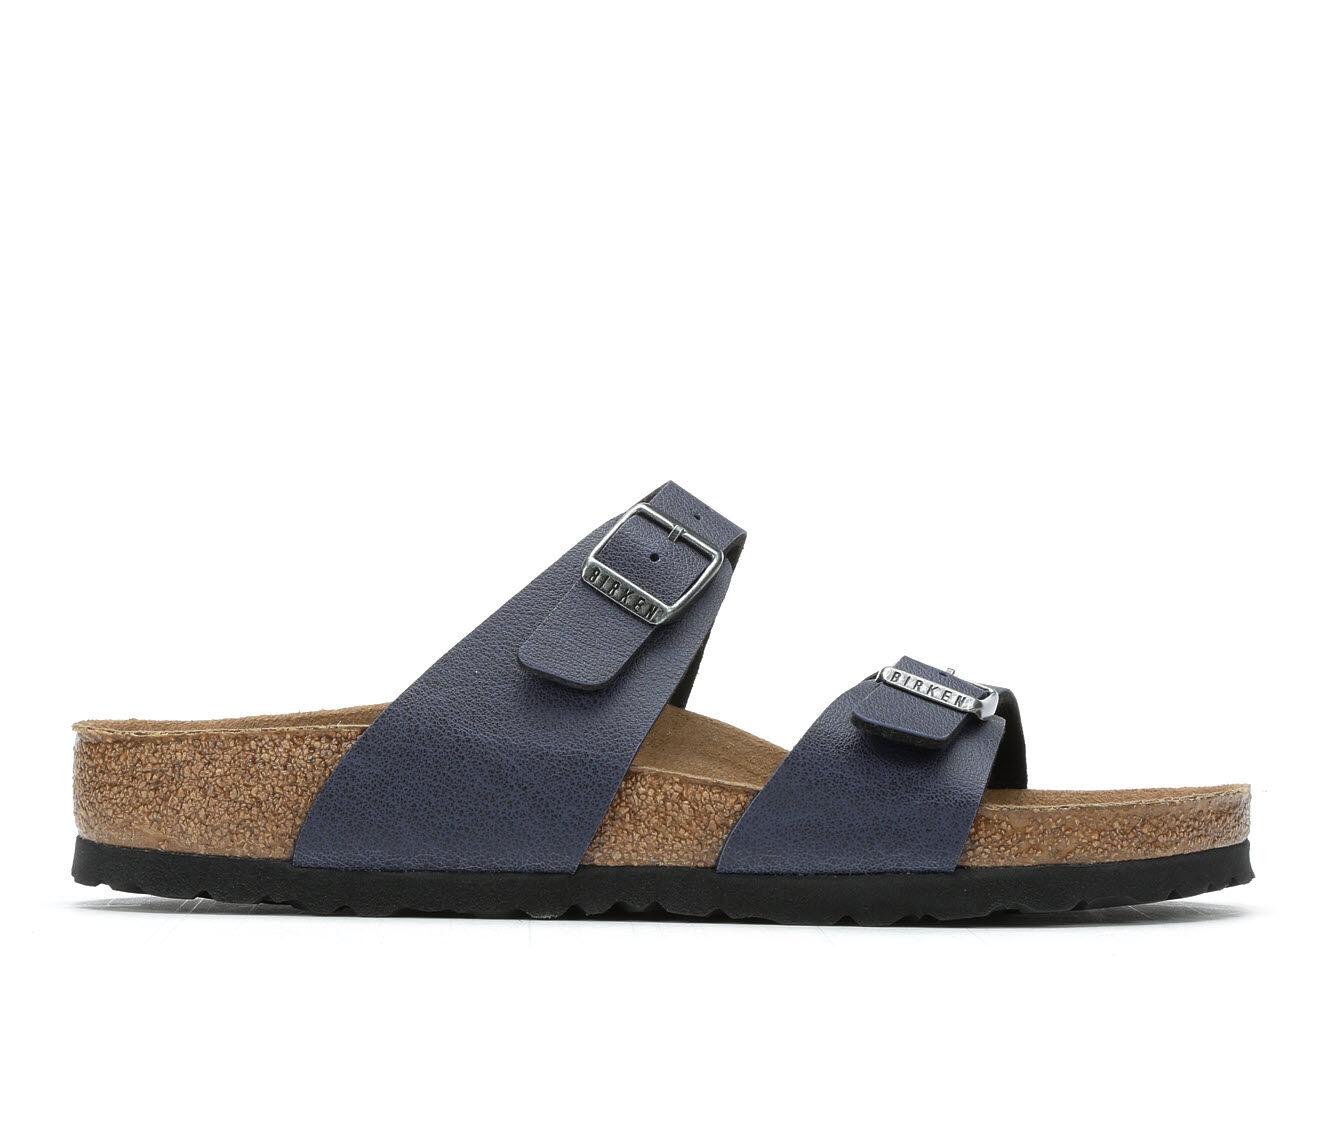 summer selling Women's Birkenstock Sydney Footbed Sandals Navy